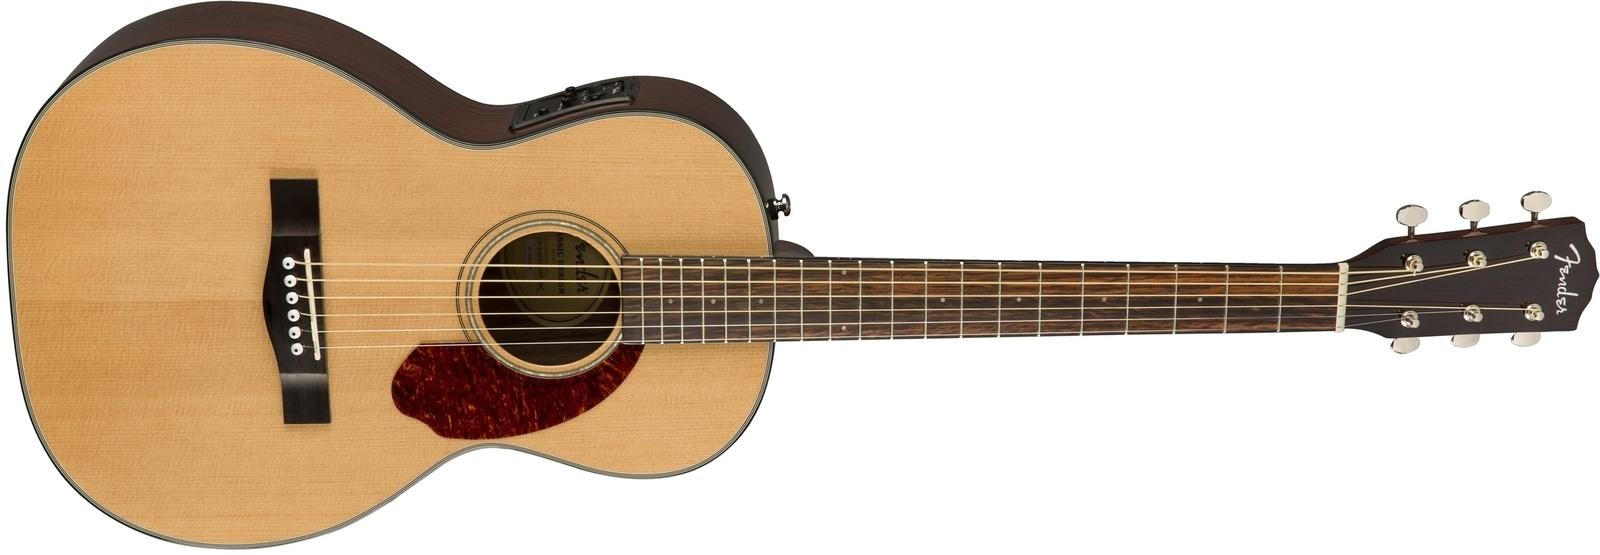 vintage guitars co uk jpg 1200x900